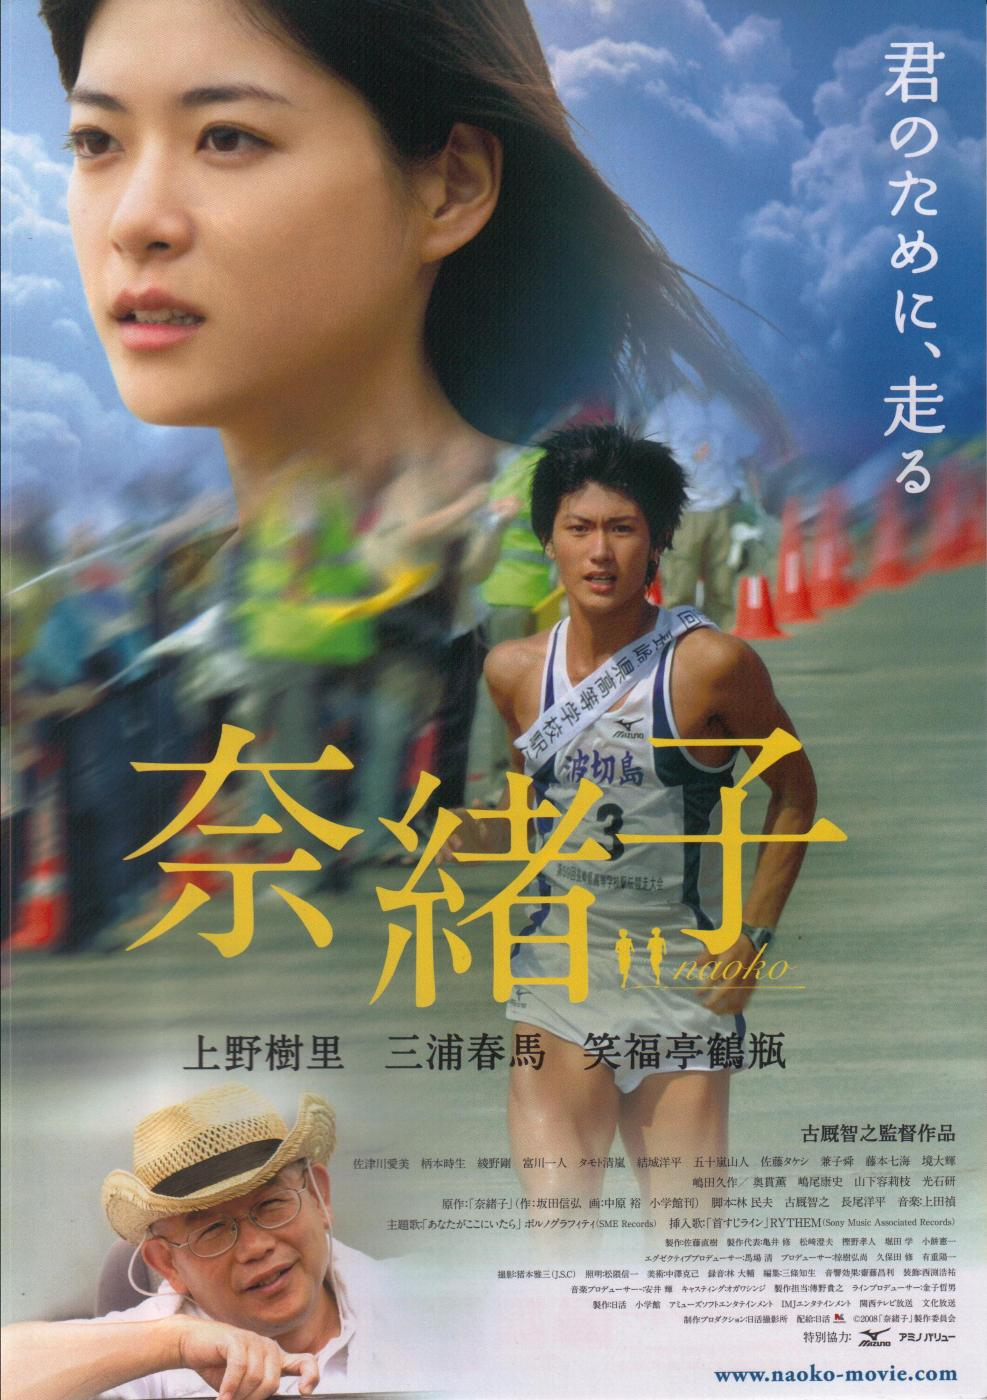 smotri-onlayn-filmi-yaponii